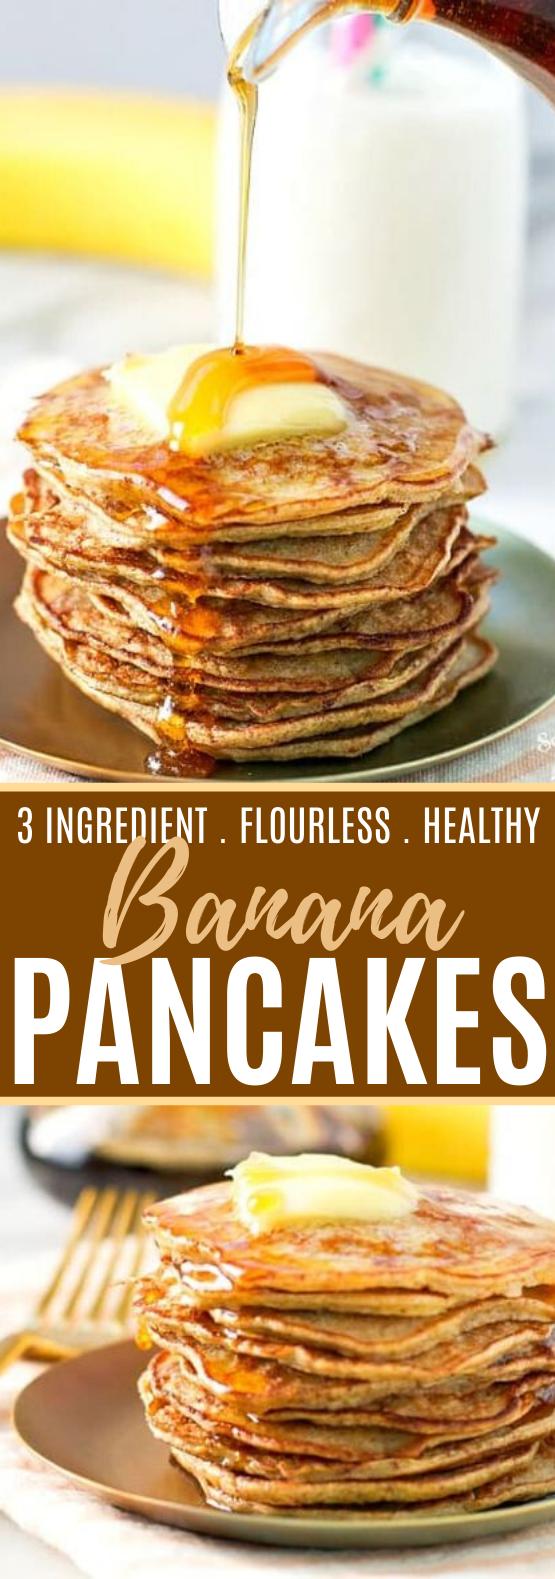 3-Ingredient Healthy Banana Pancakes #healthy #breakfast #glutenfree #easy #paleo